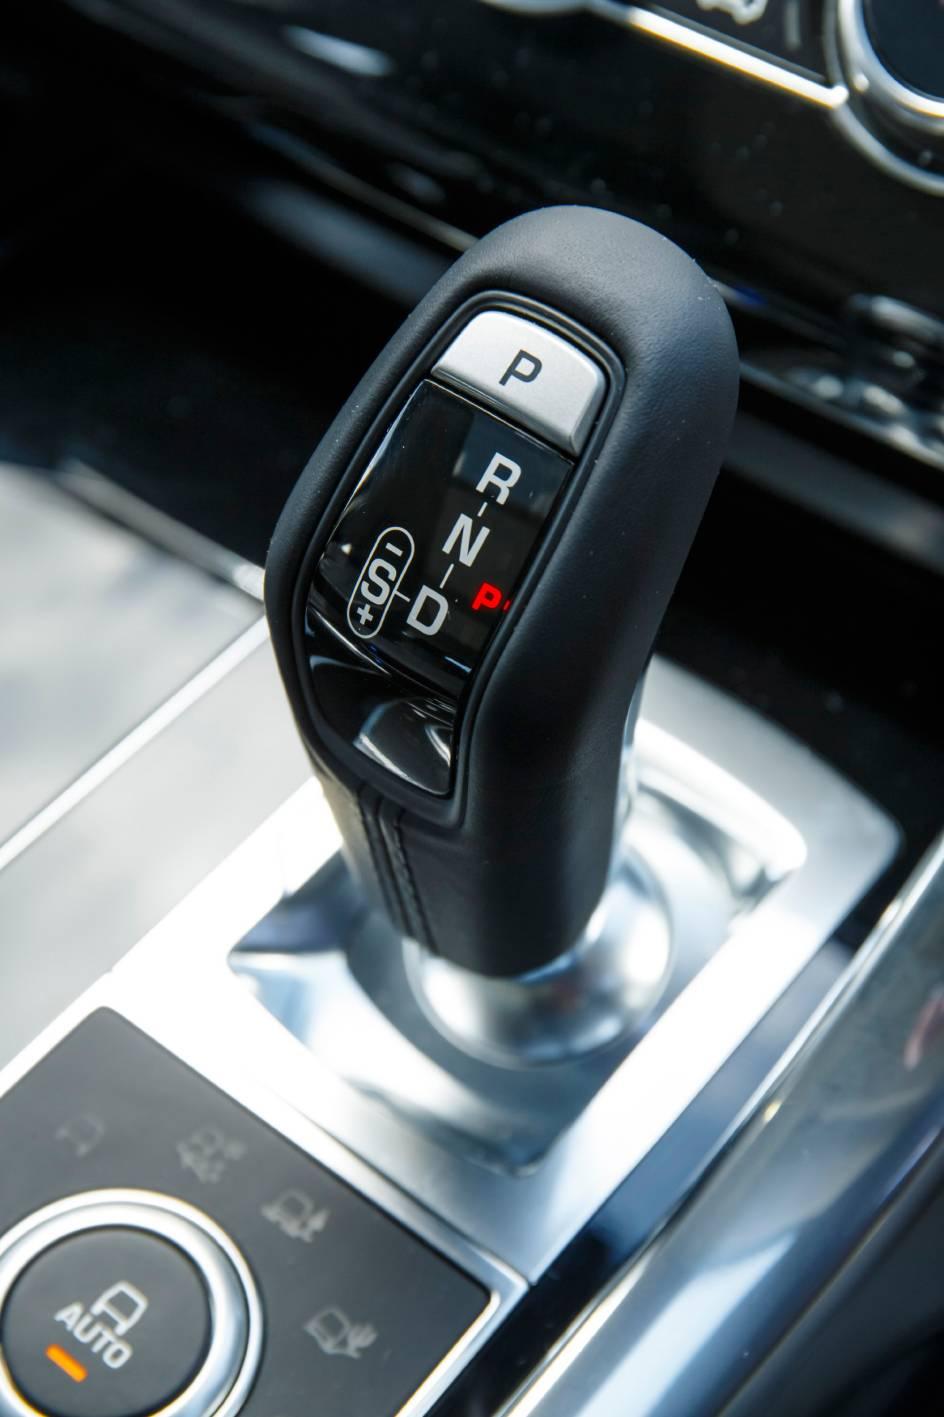 2014 Range Rover Sport Interior Gear Lever Forcegt Com